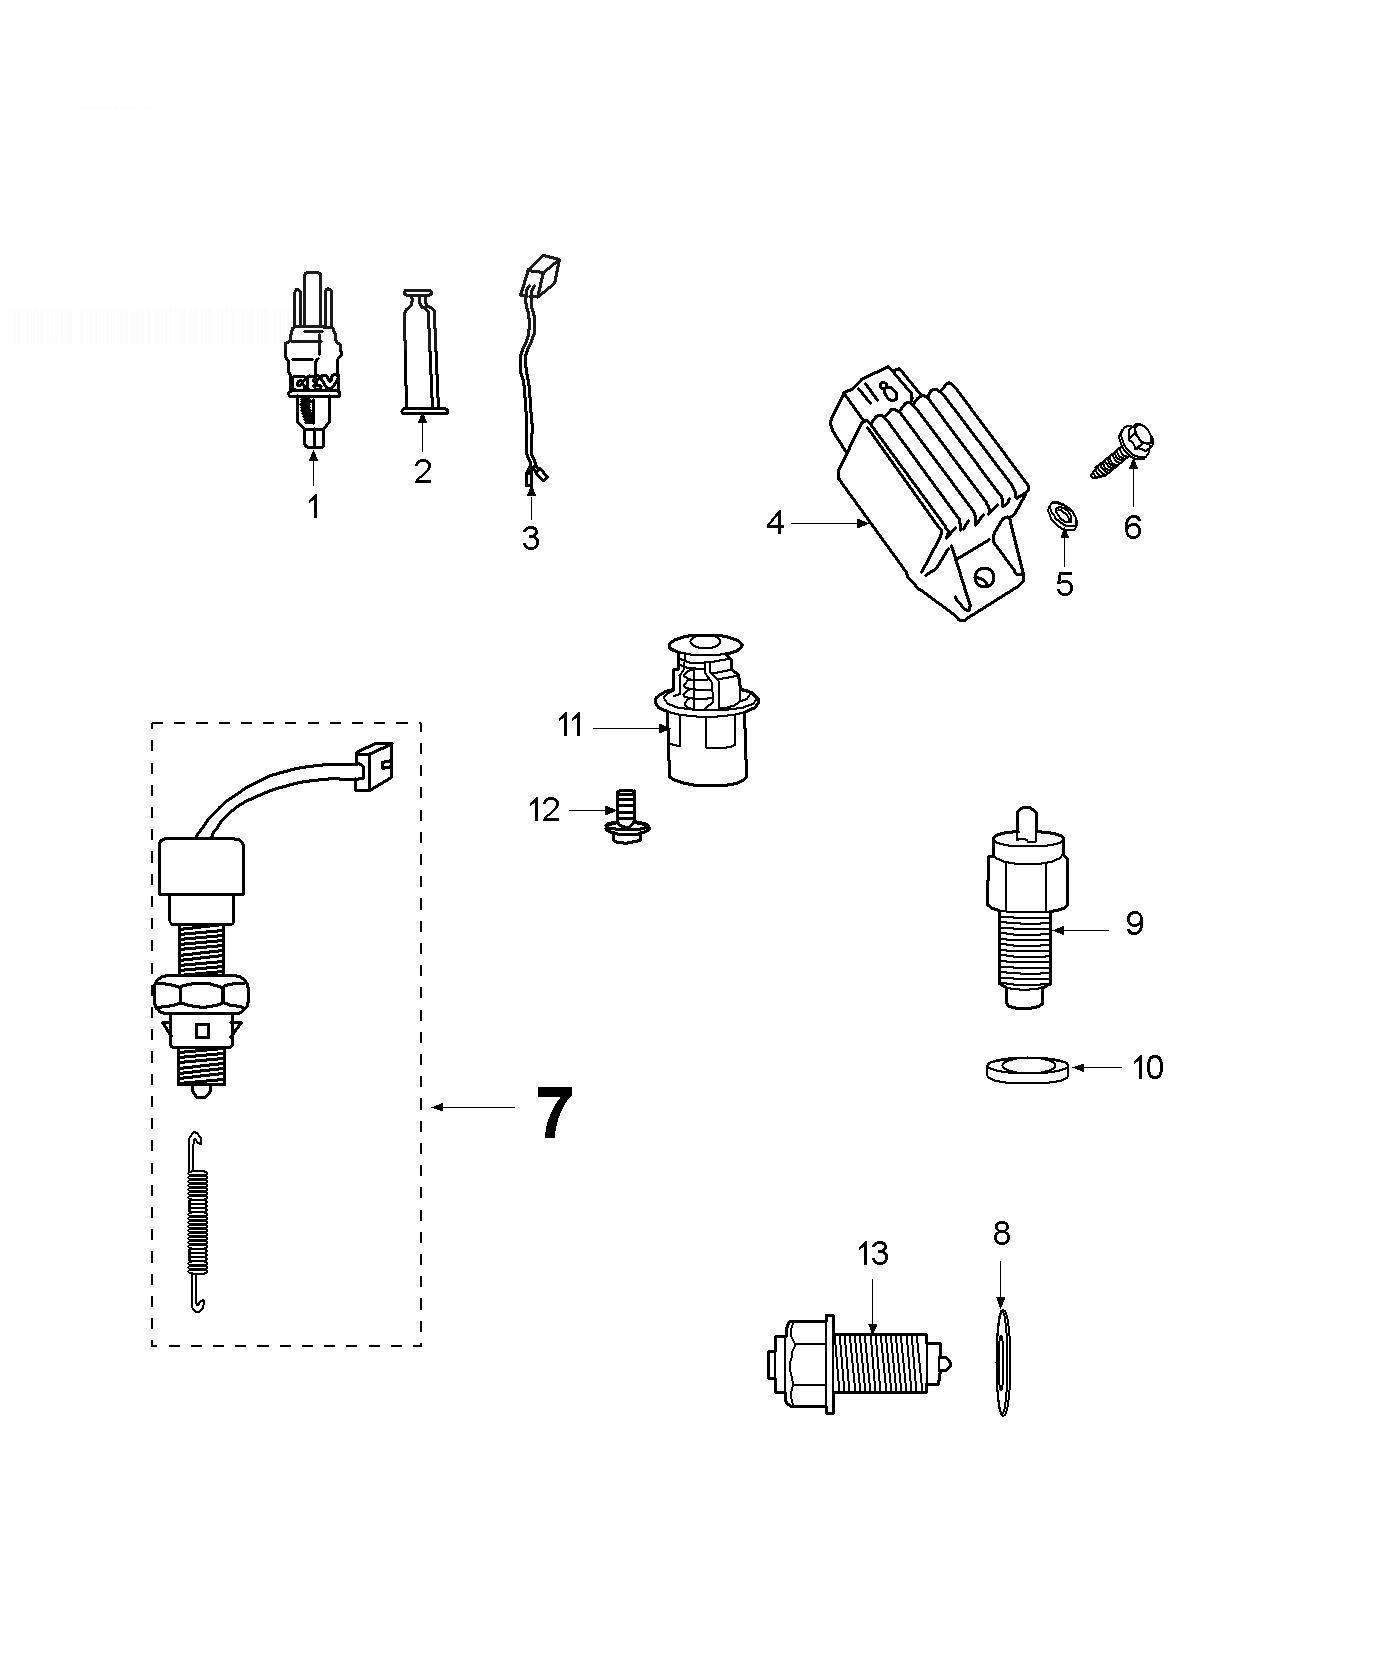 Peugeot Xps T Electric Equipment